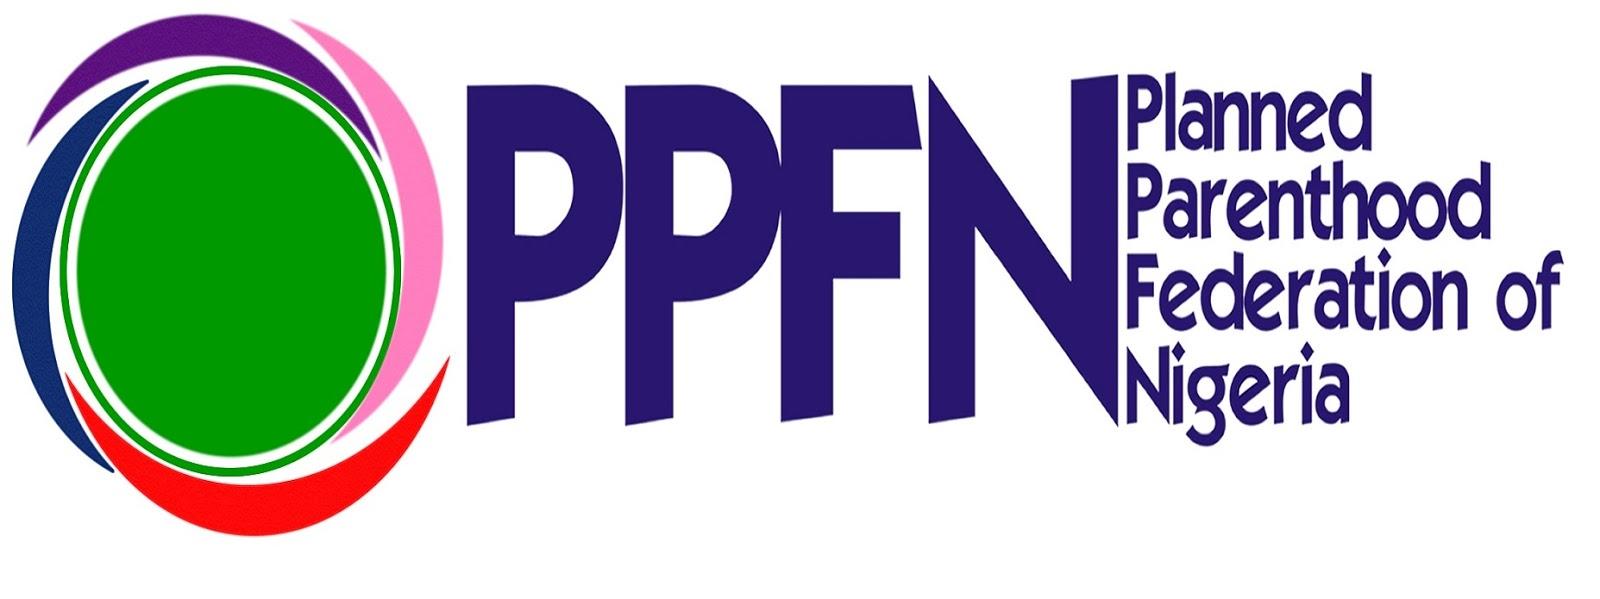 PPFN Recruitment Portal 2019